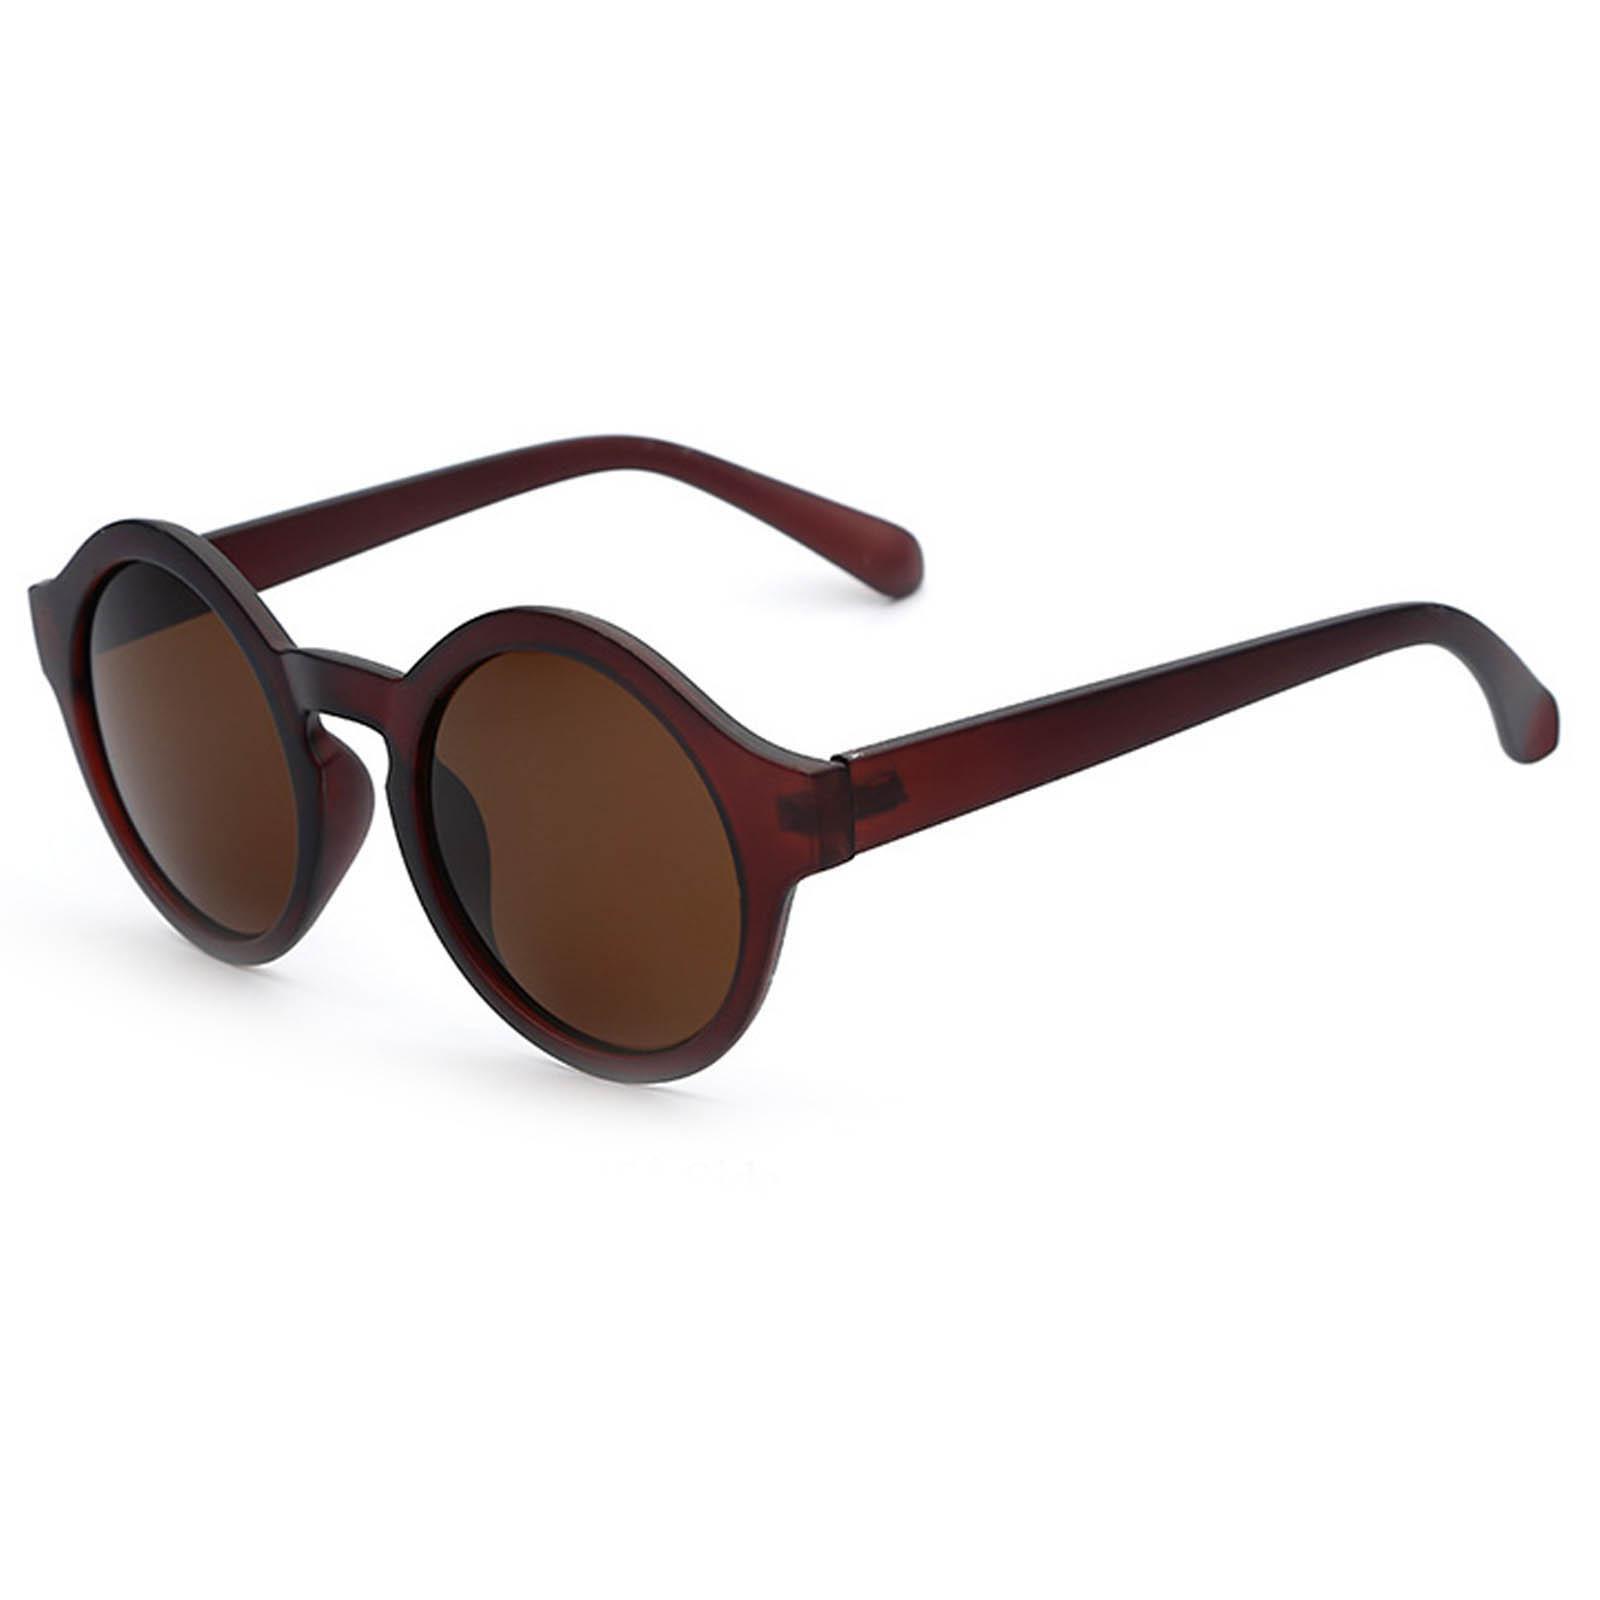 Circle Lens Sunglasses  owl 010 c7 round eyewear sunglasses women s men s plastic round